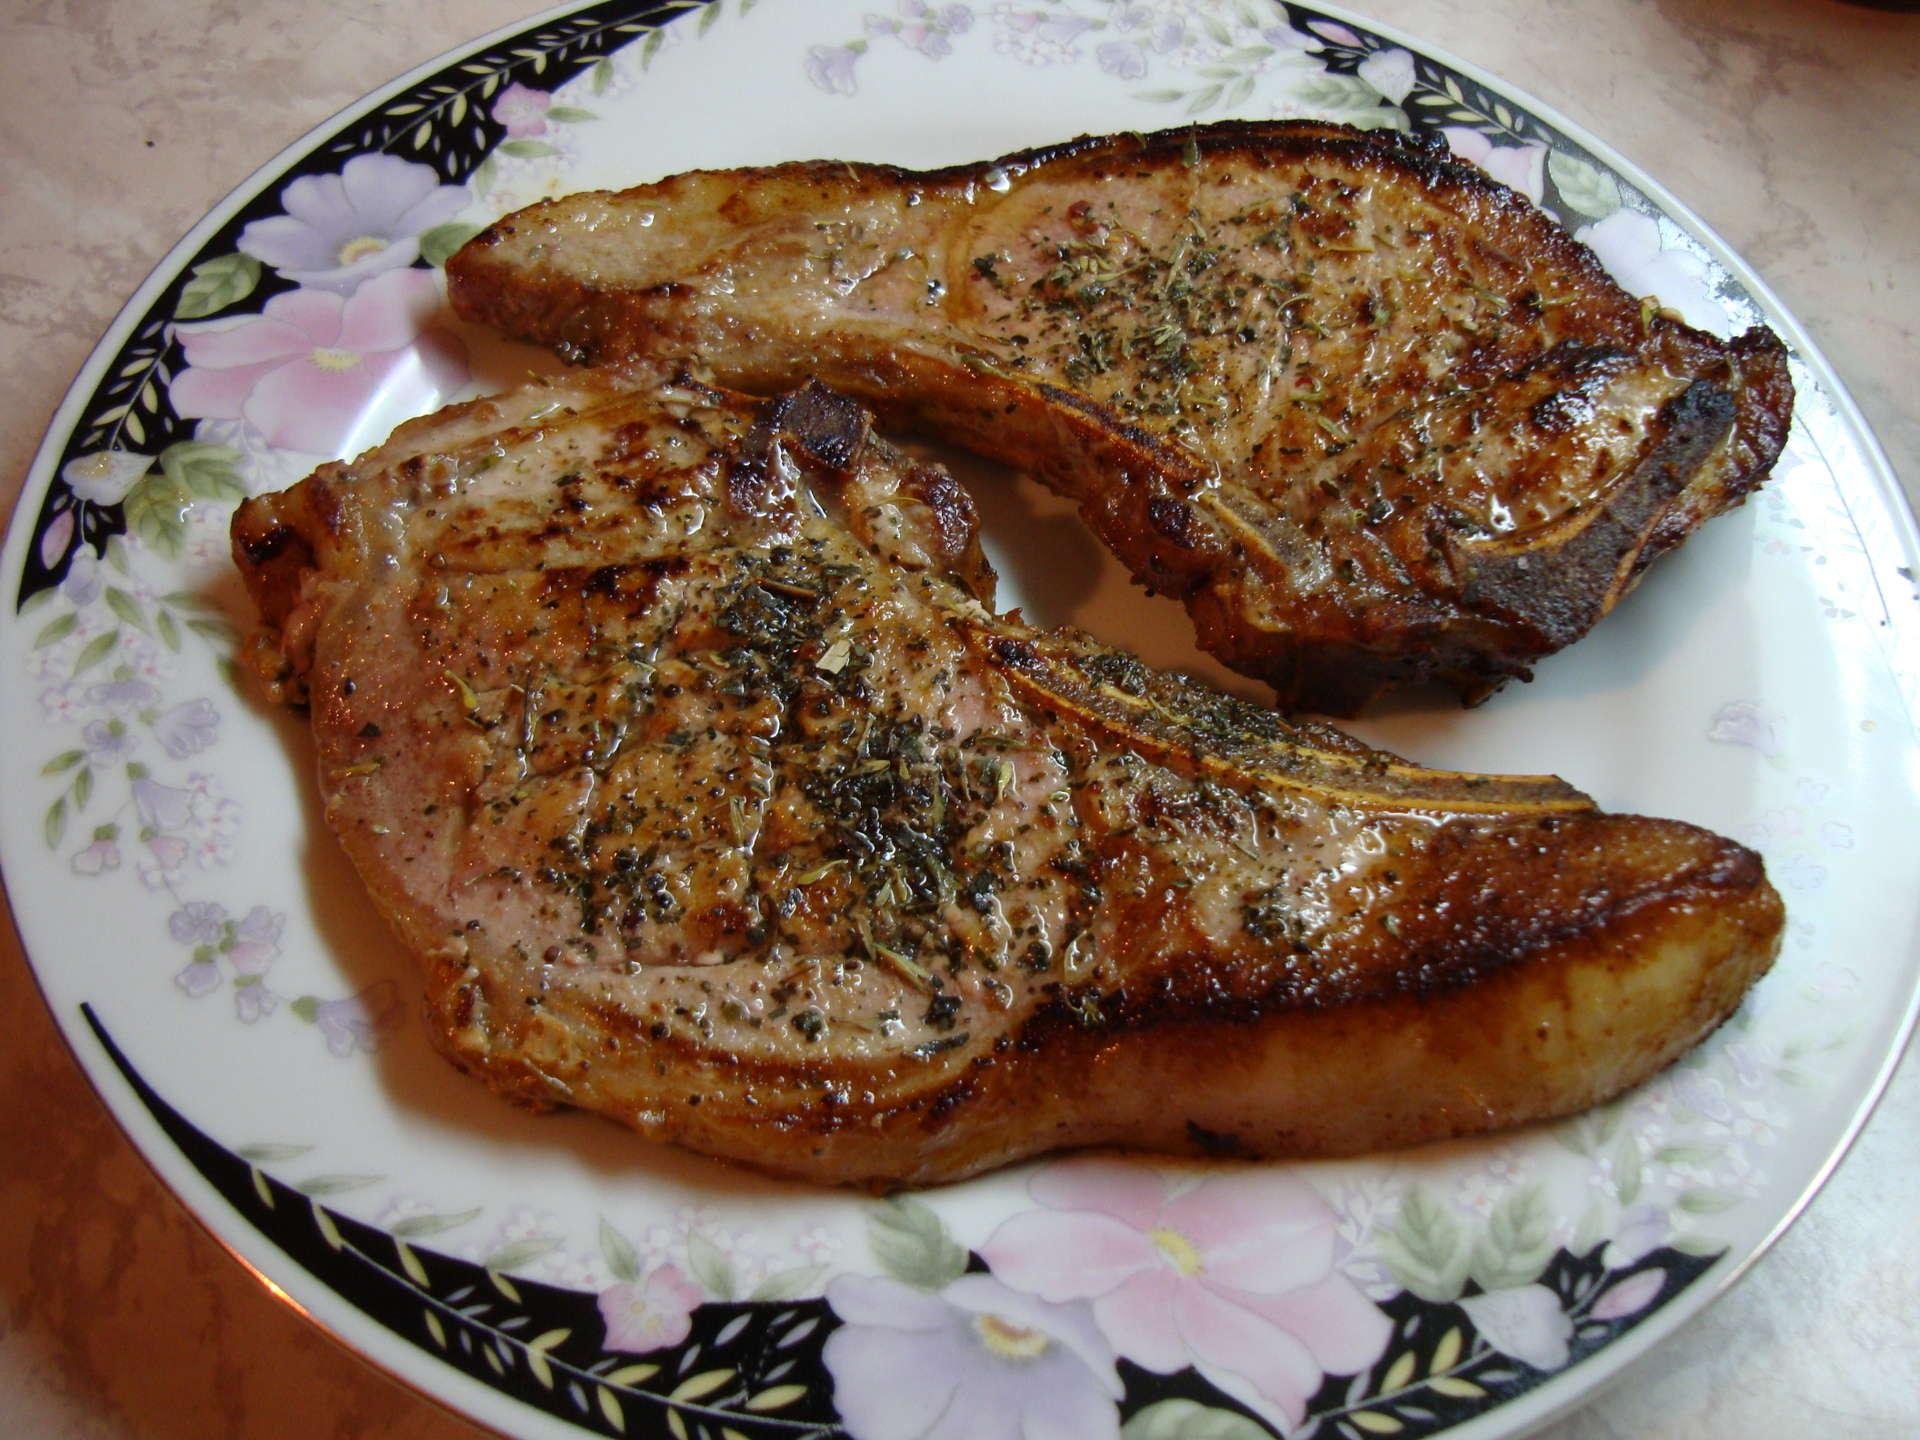 Котлета на косточке из свинины на сковороде рецепт с пошагово